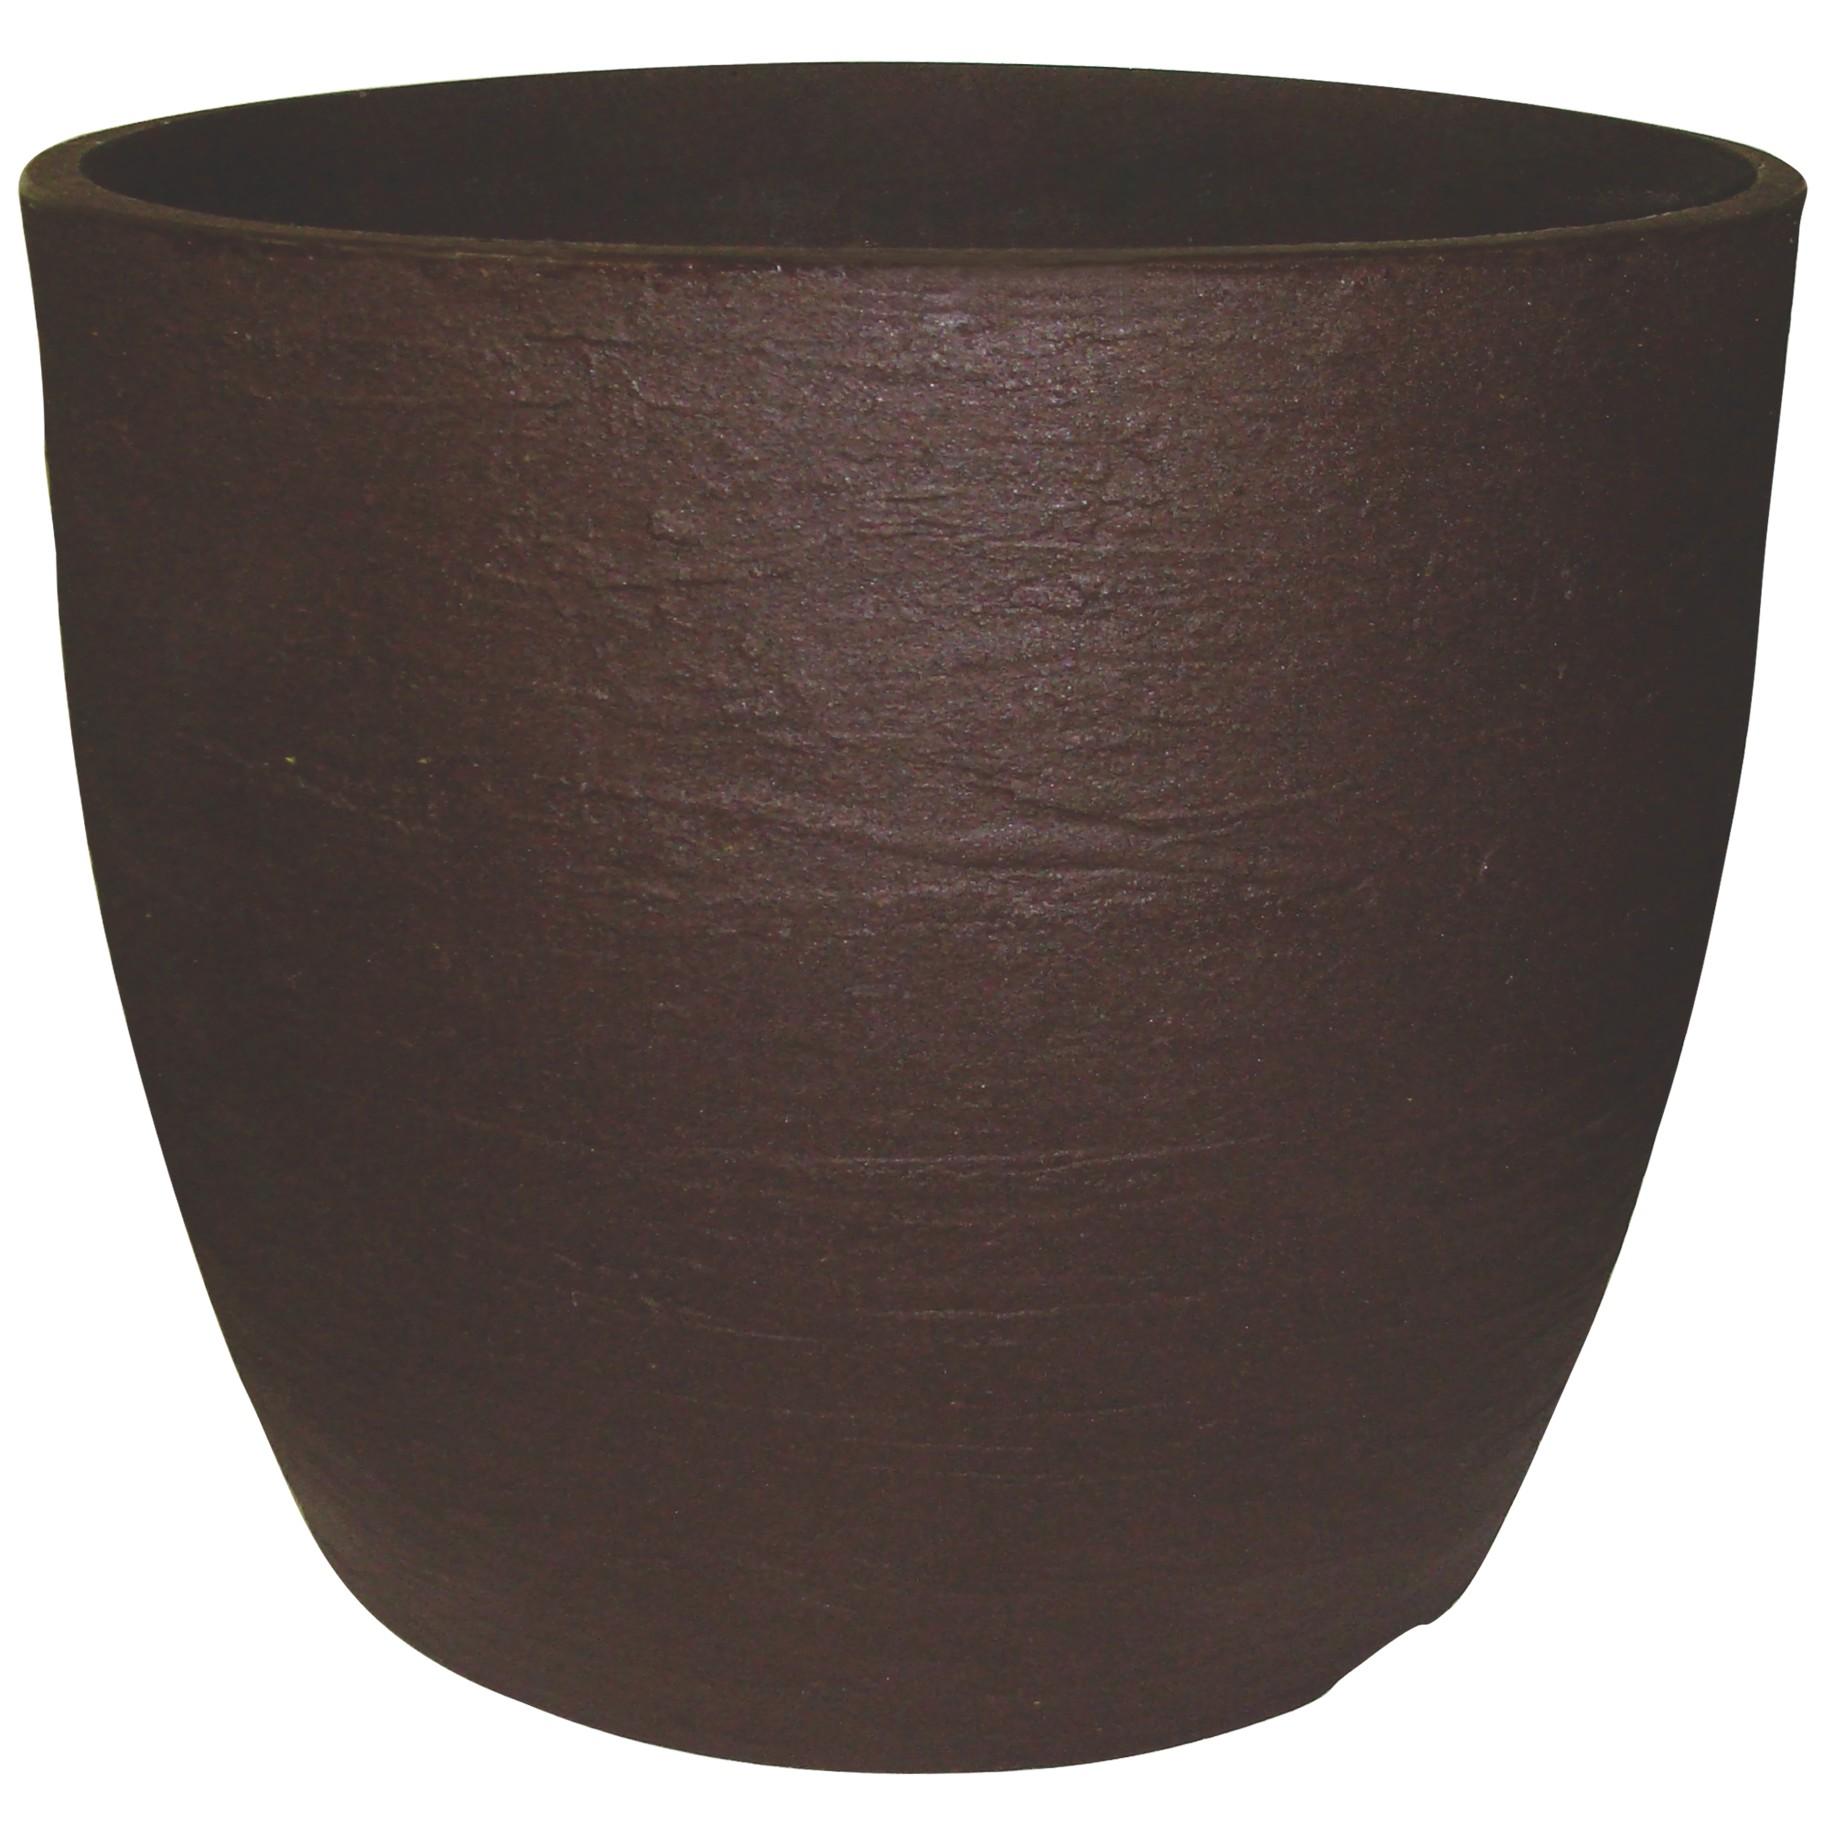 Vaso para Plantas Polietileno 33x42 cm Europa Cafe - Japi